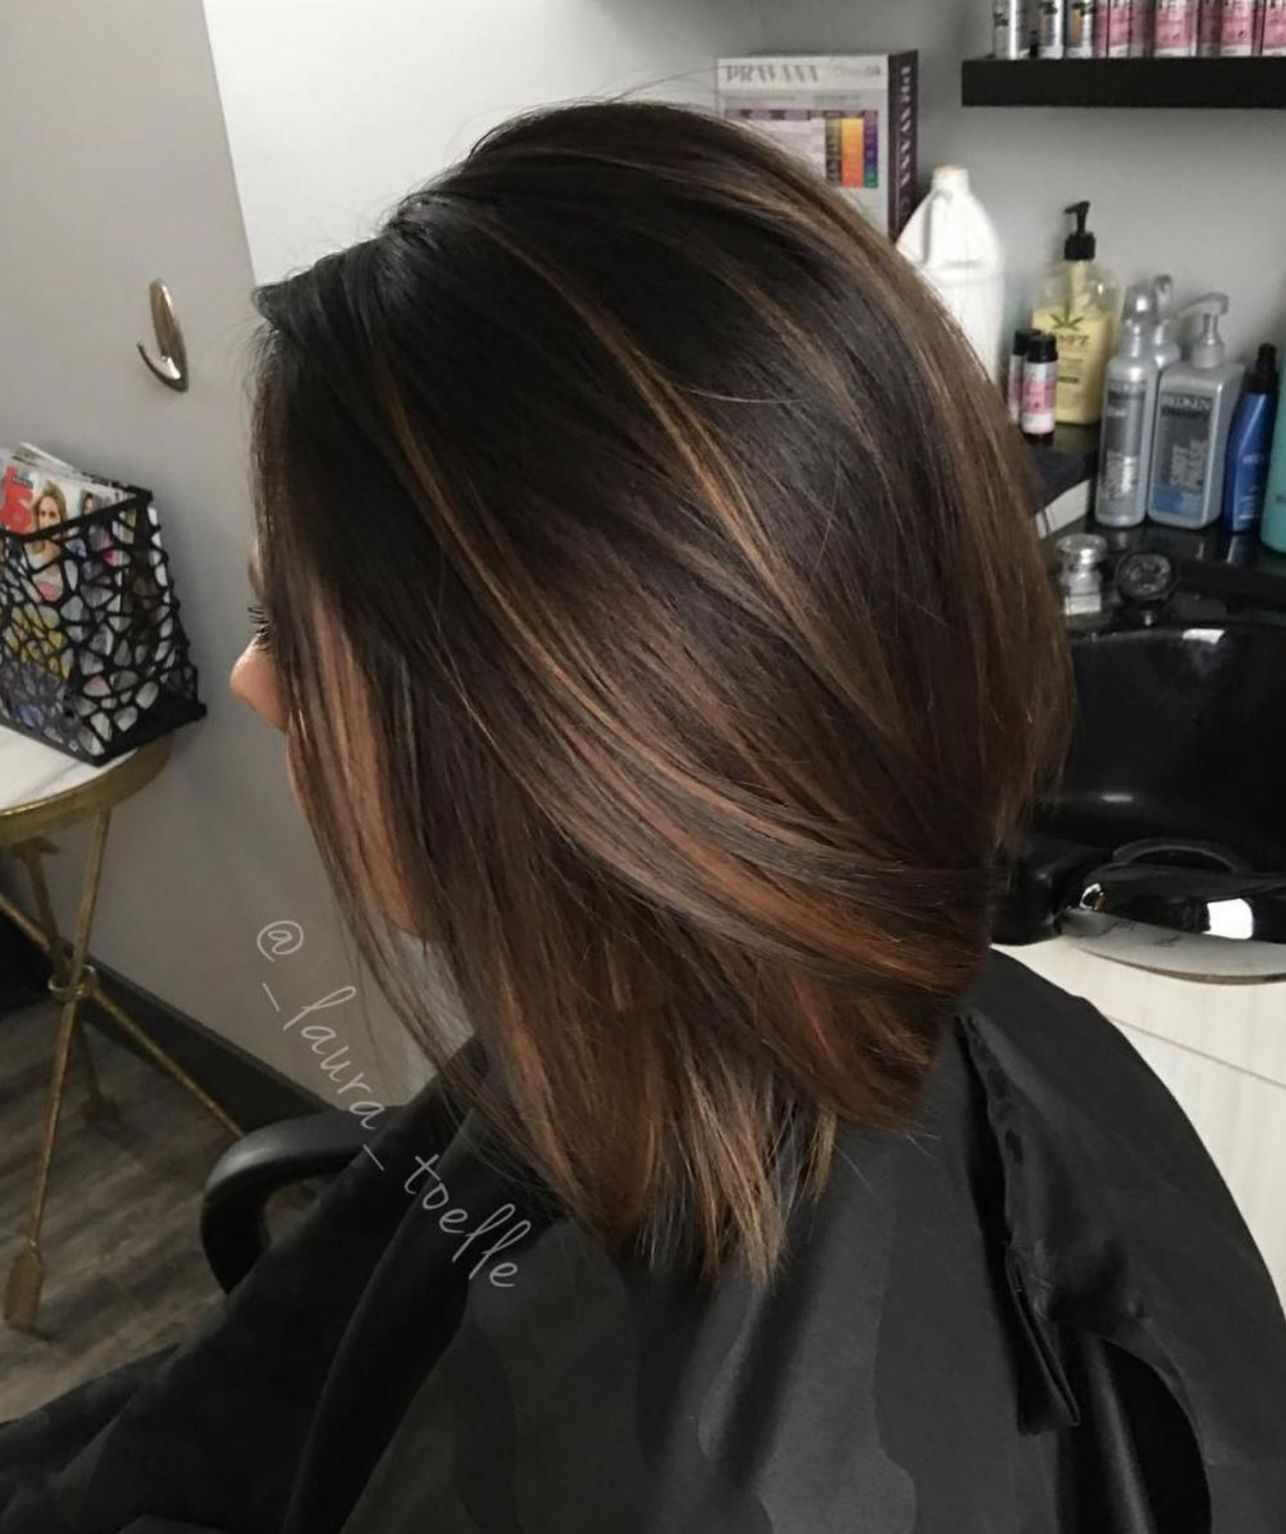 Subtle Balayage For Fine Brown Hair Halflang Haar Bruin Donkerbruin Haar Balayage Kort Haar